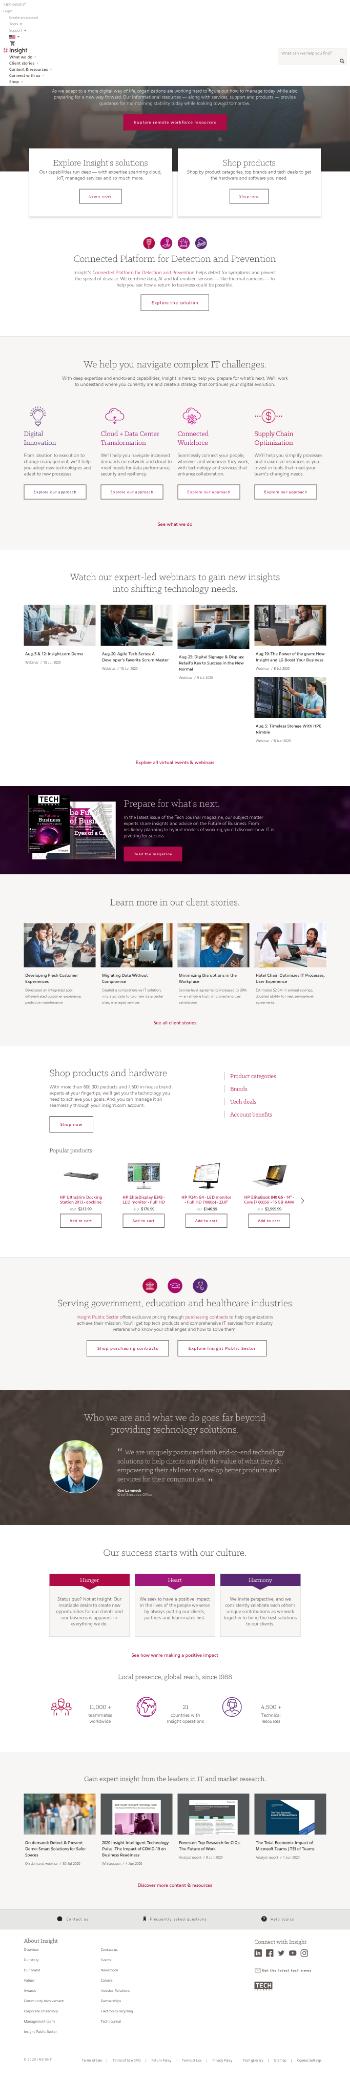 Insight Enterprises, Inc. Website Screenshot